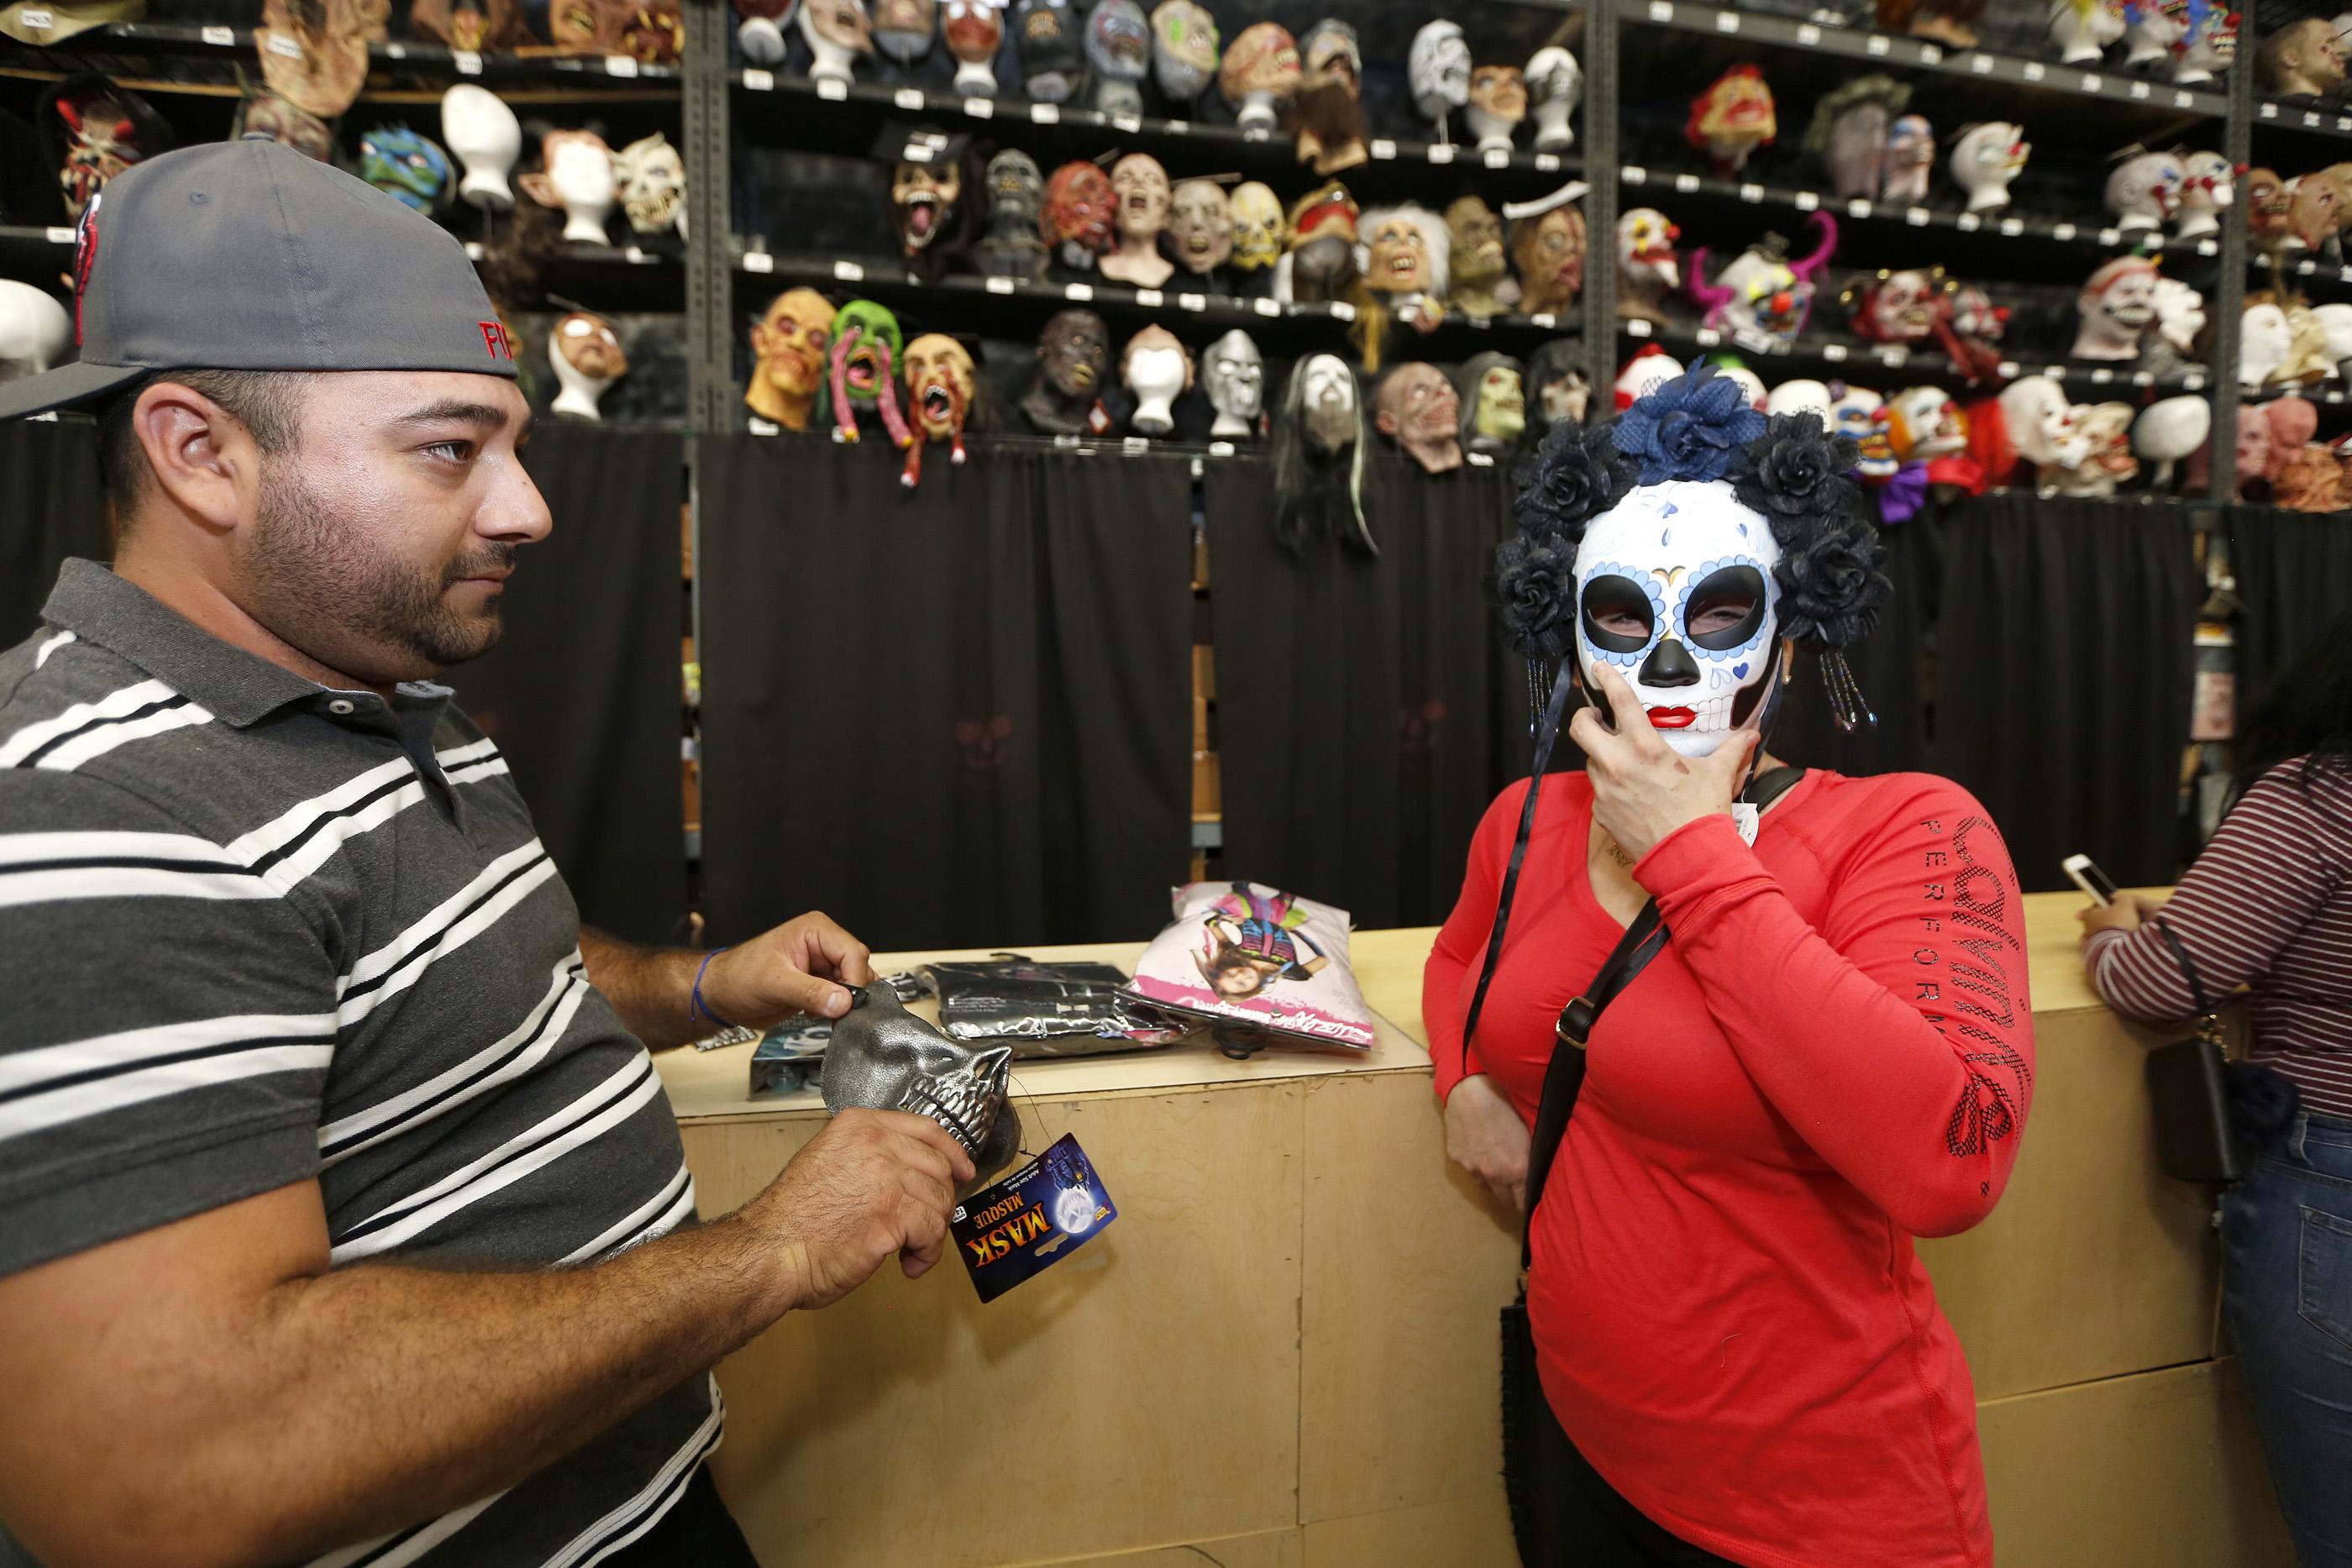 10/26/16 /LOS ANGELES/Xitlaly Rubio and Luis Moreno shop for their Halloween customs at the Halloween Club store in Montebello. (Photo by Aurelia Ventura/La Opinion)